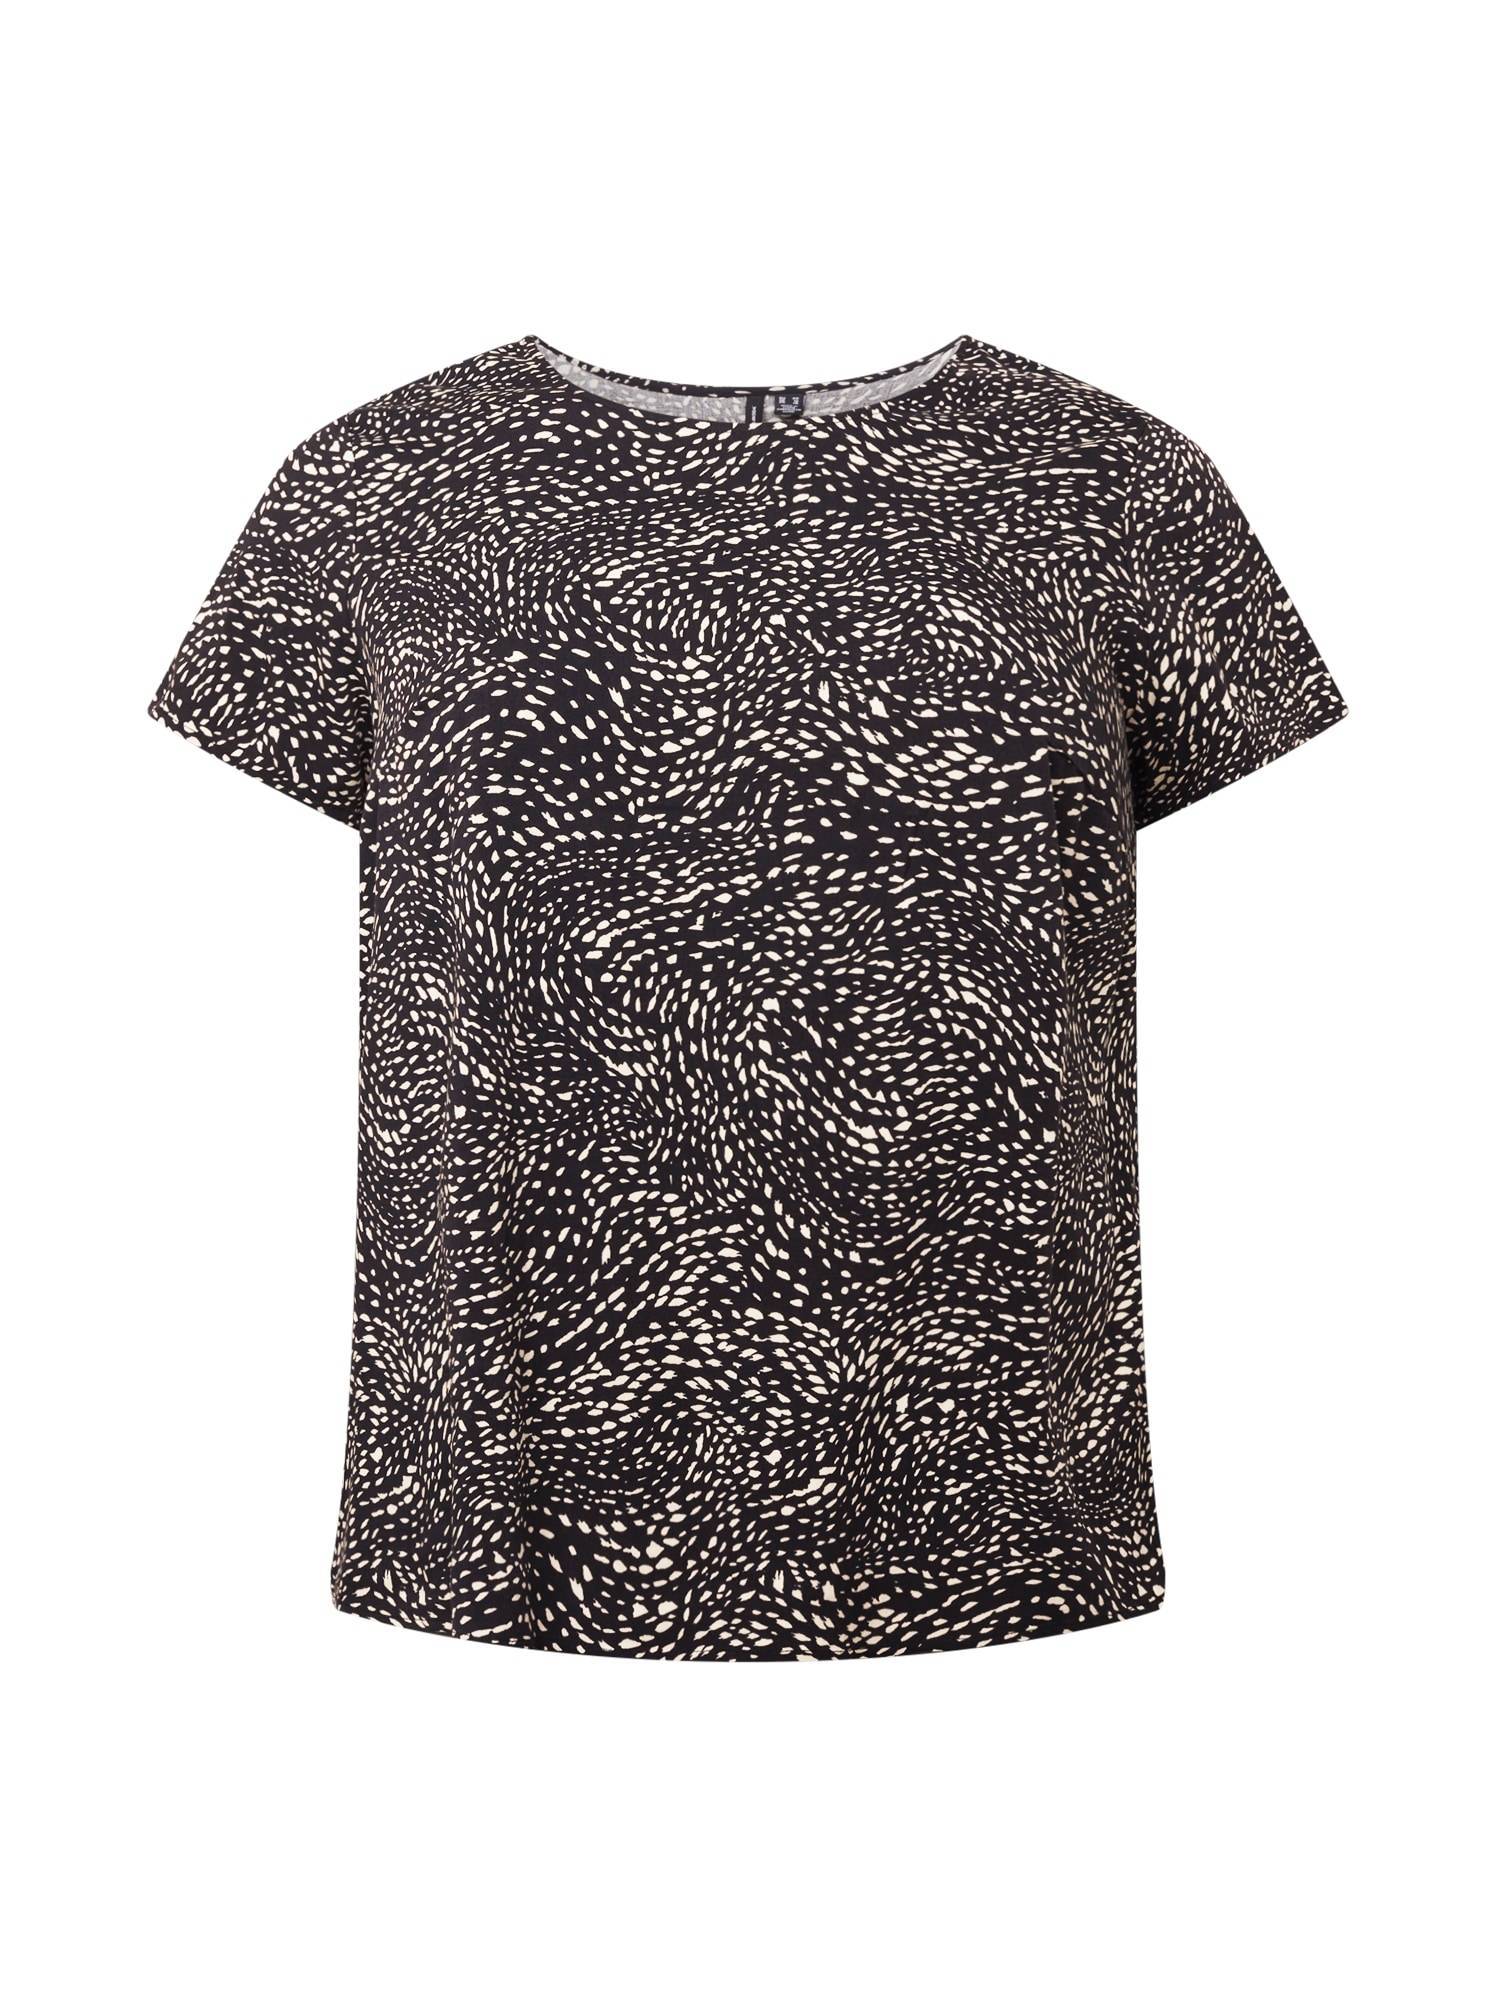 Vero Moda Curve T-shirt 'BACA'  - Noir - Taille: 46 - female